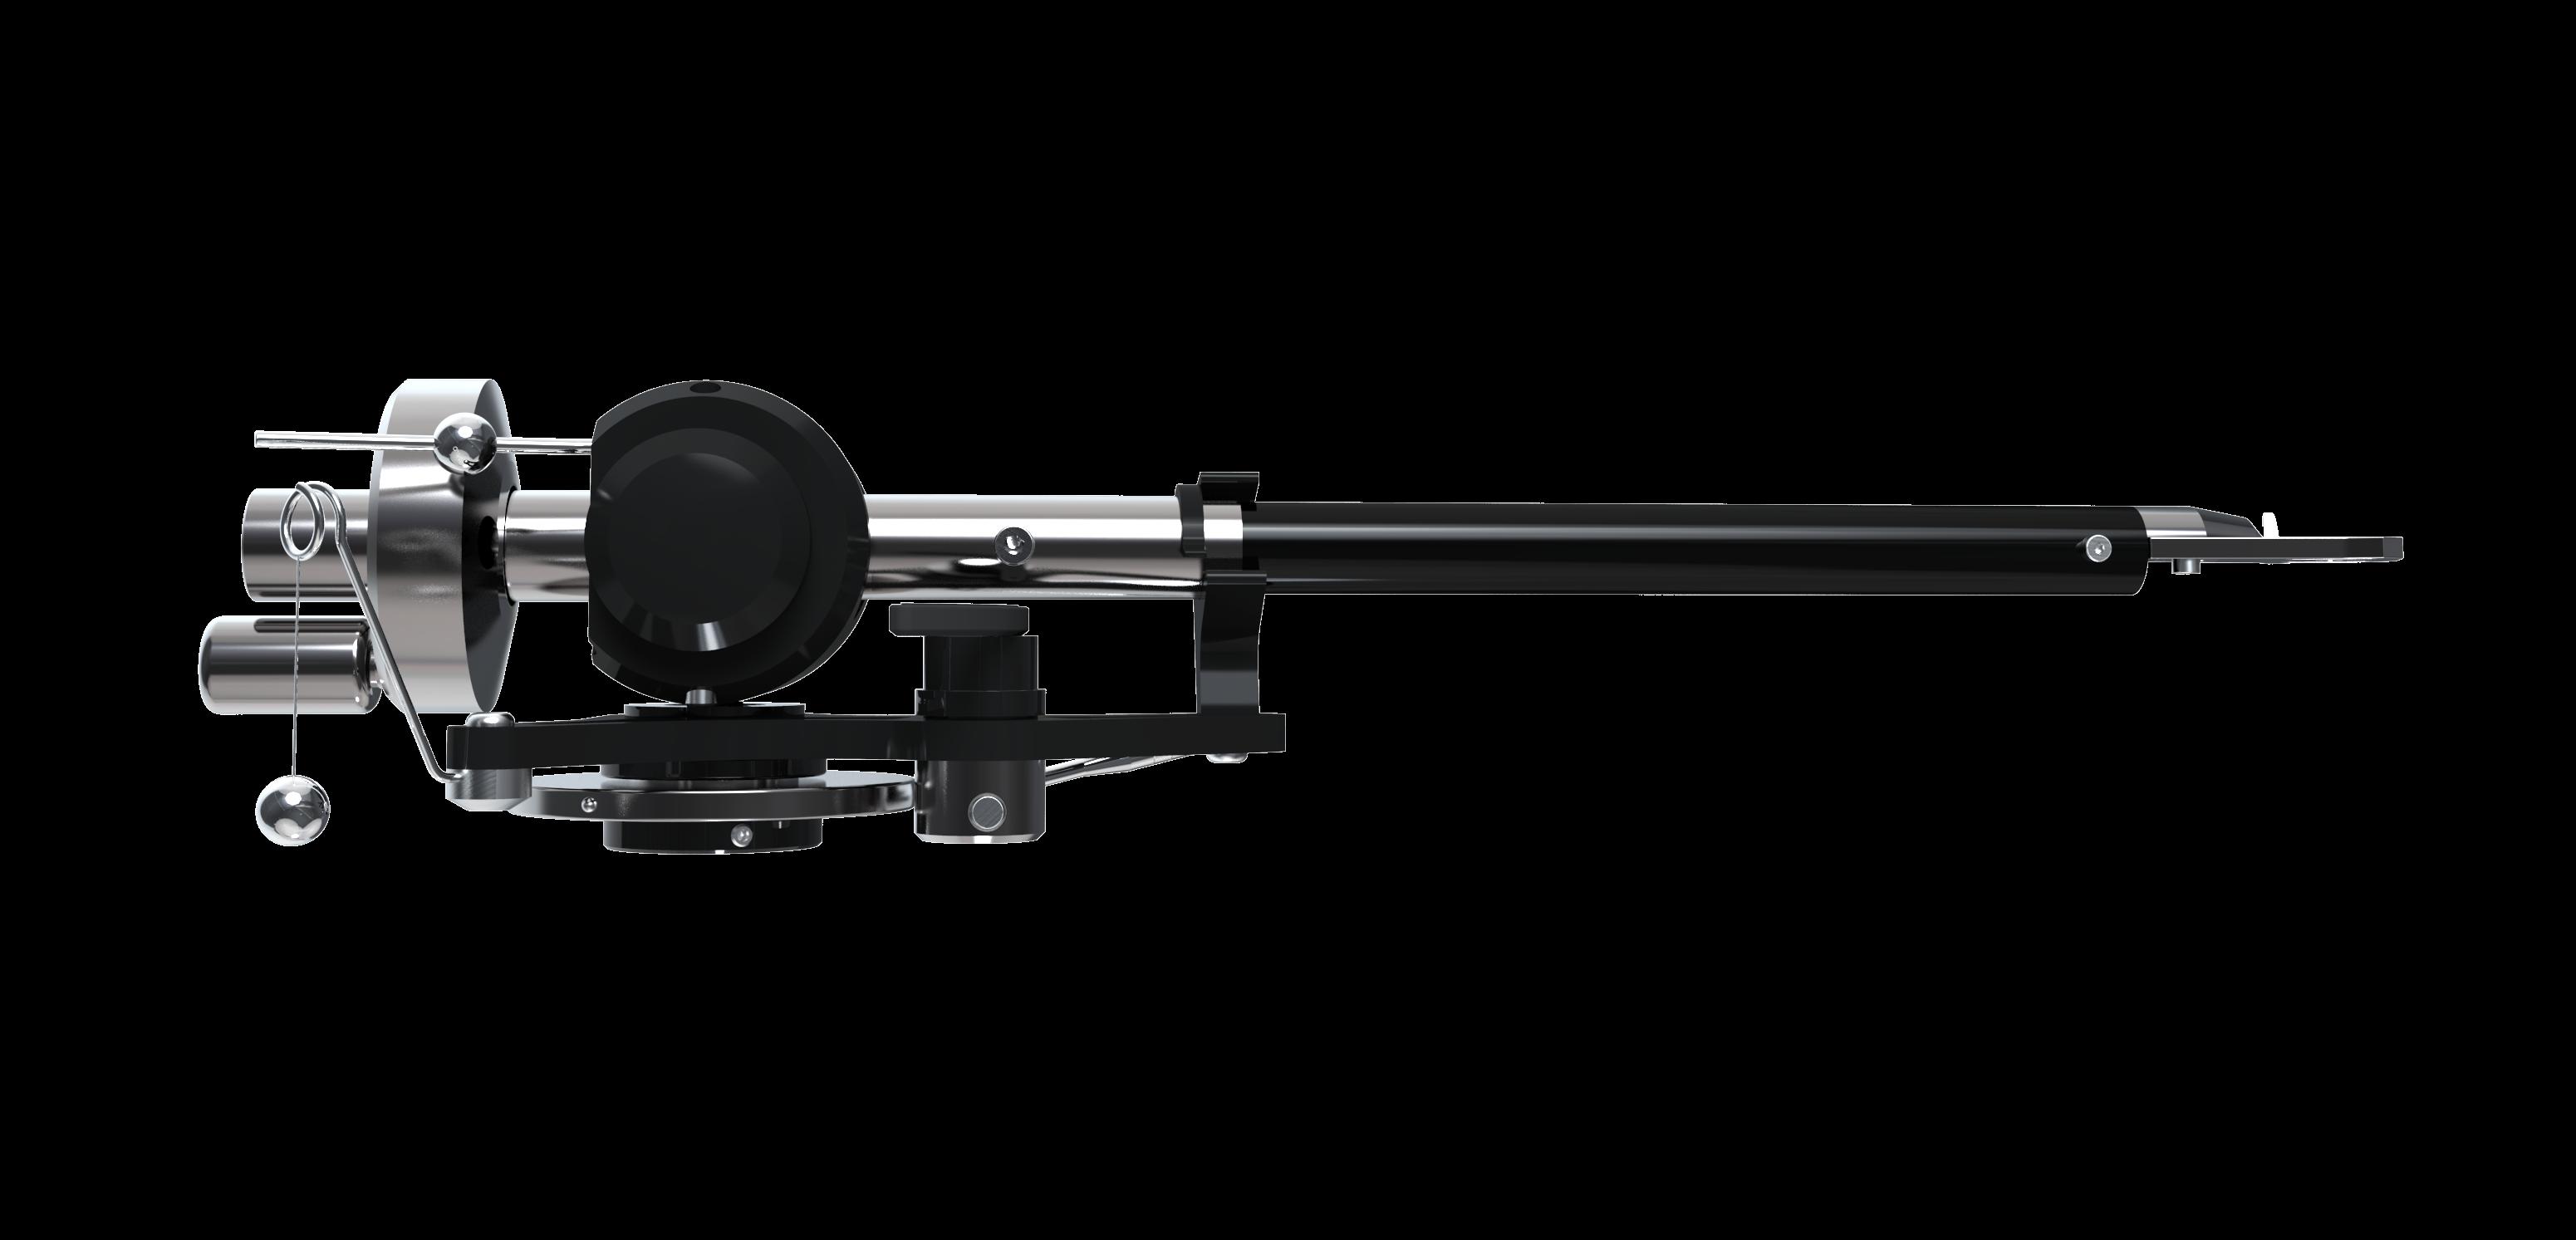 tracking tonearm - illustrious tonearm - side shot